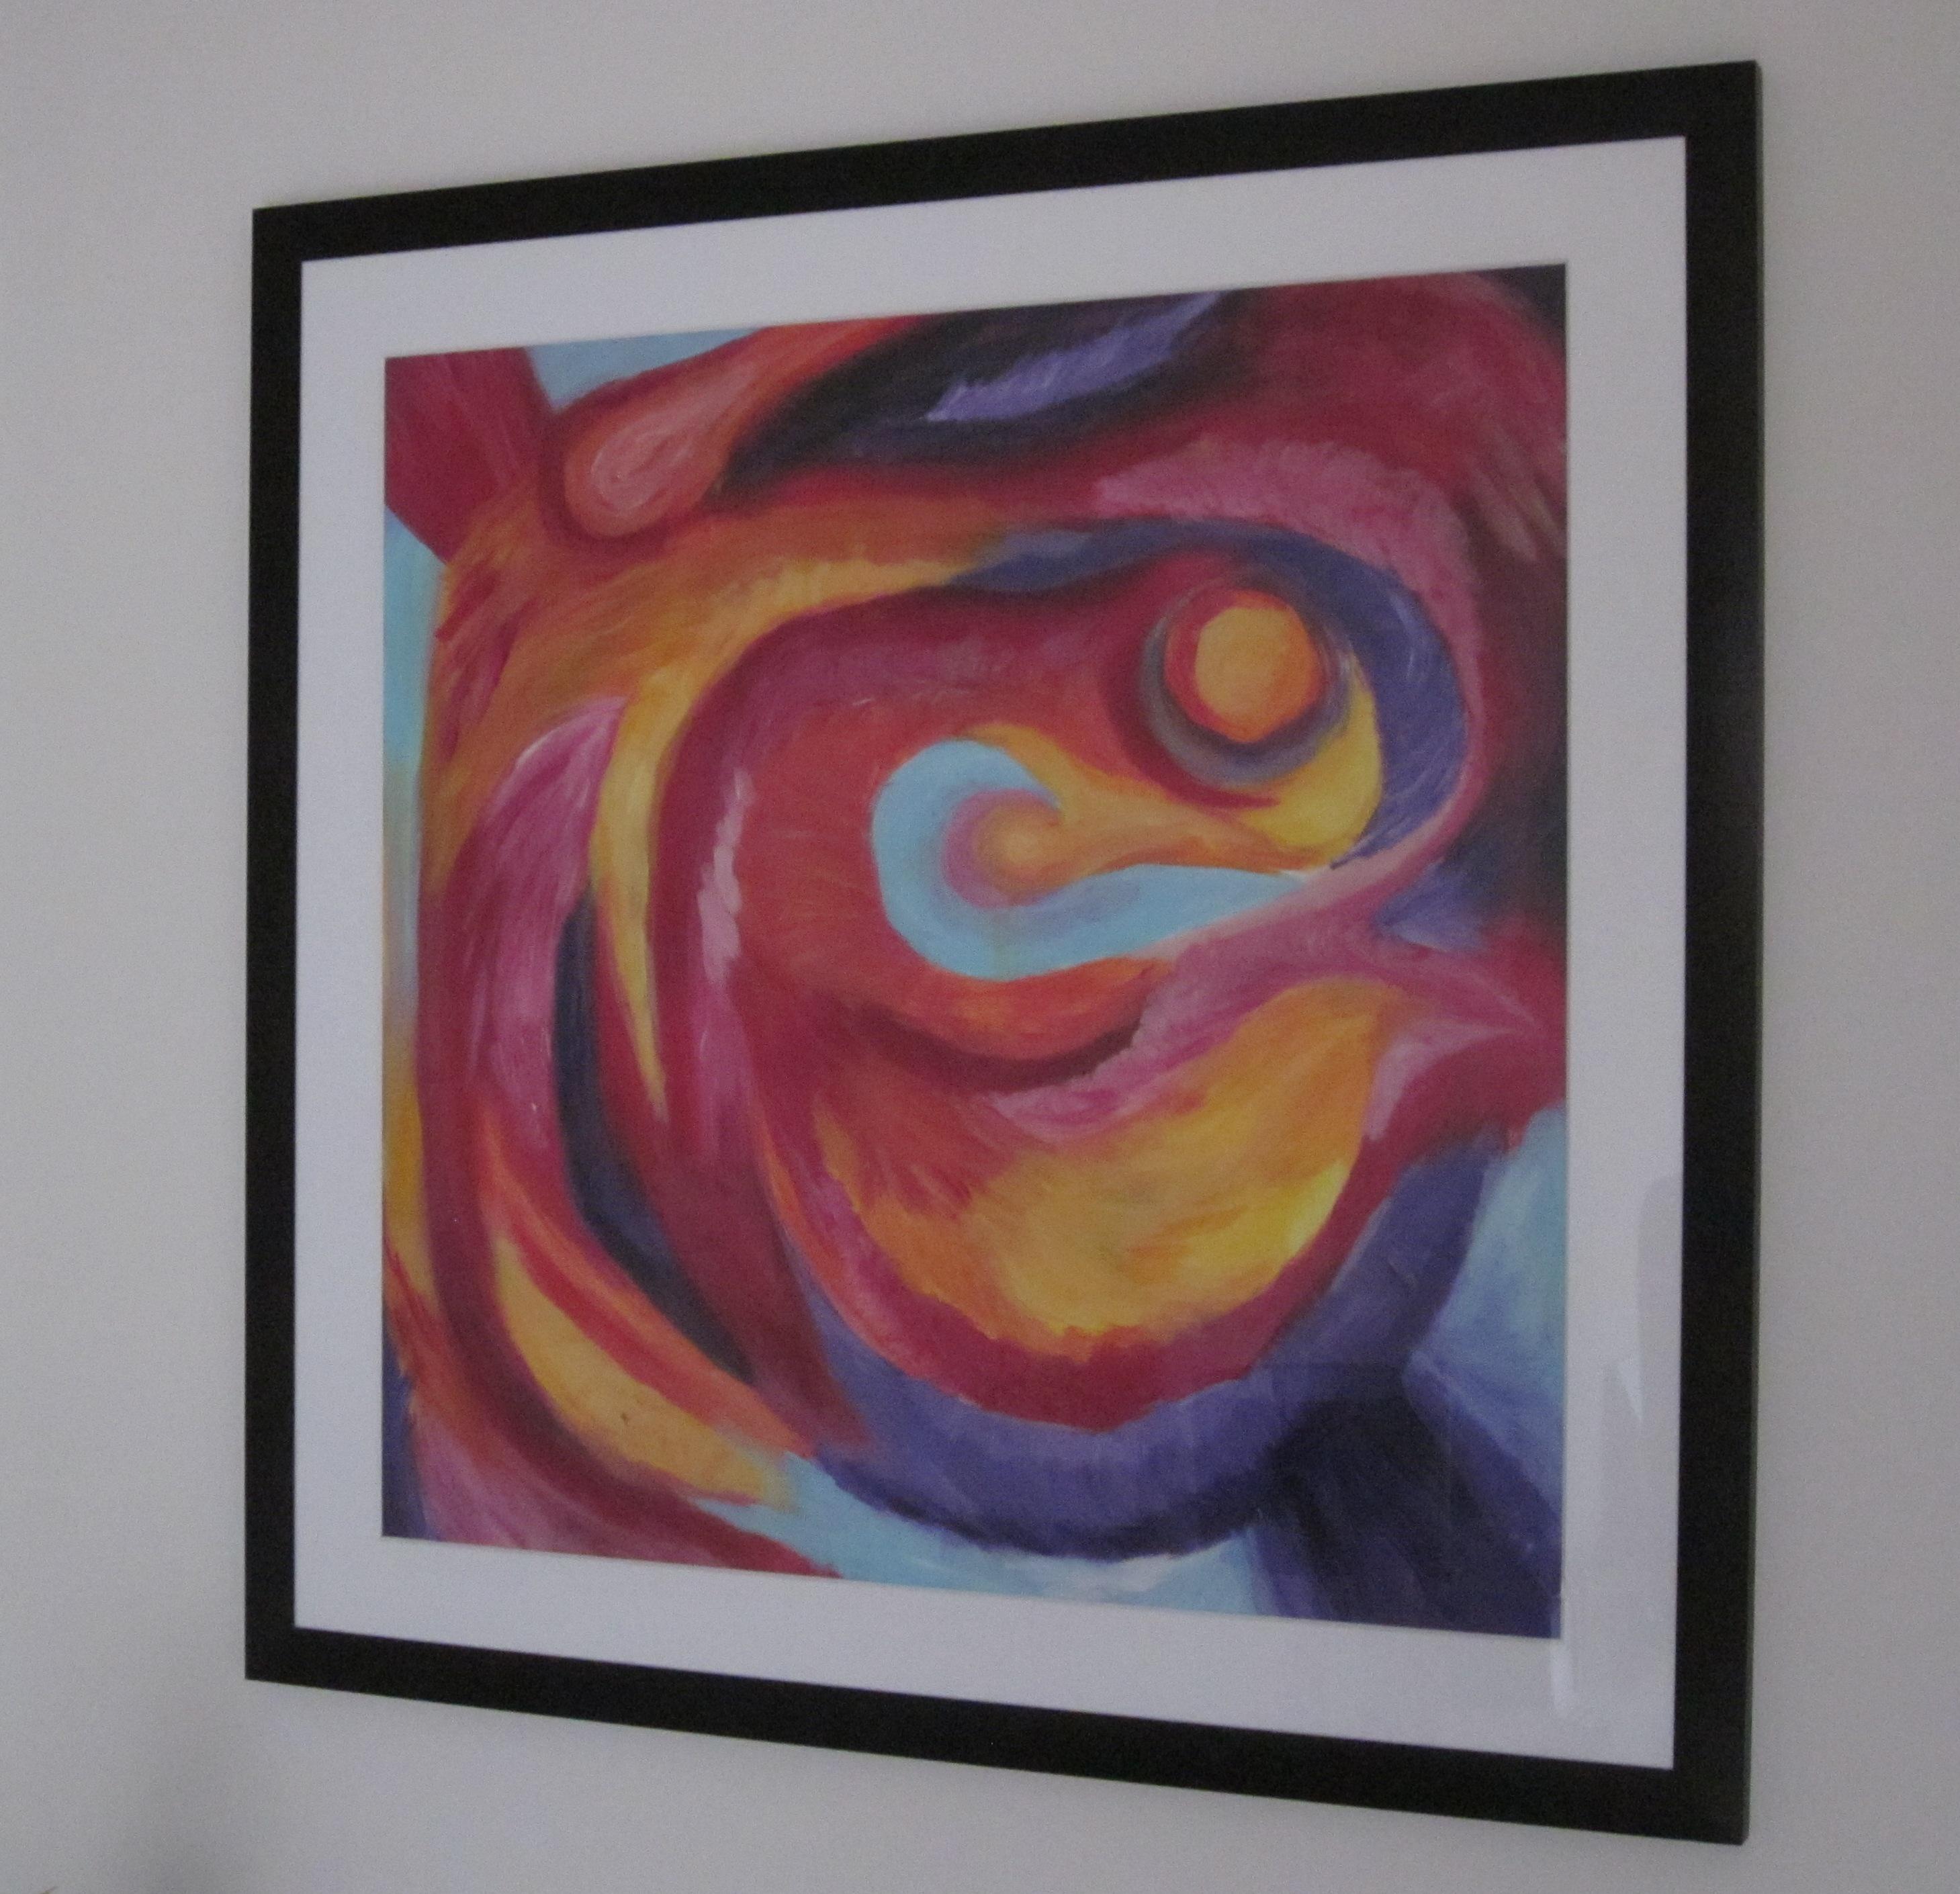 Kleurrijk (2011) - acryl op acrylpapier, 58 bij 58 cm (privé collectie)